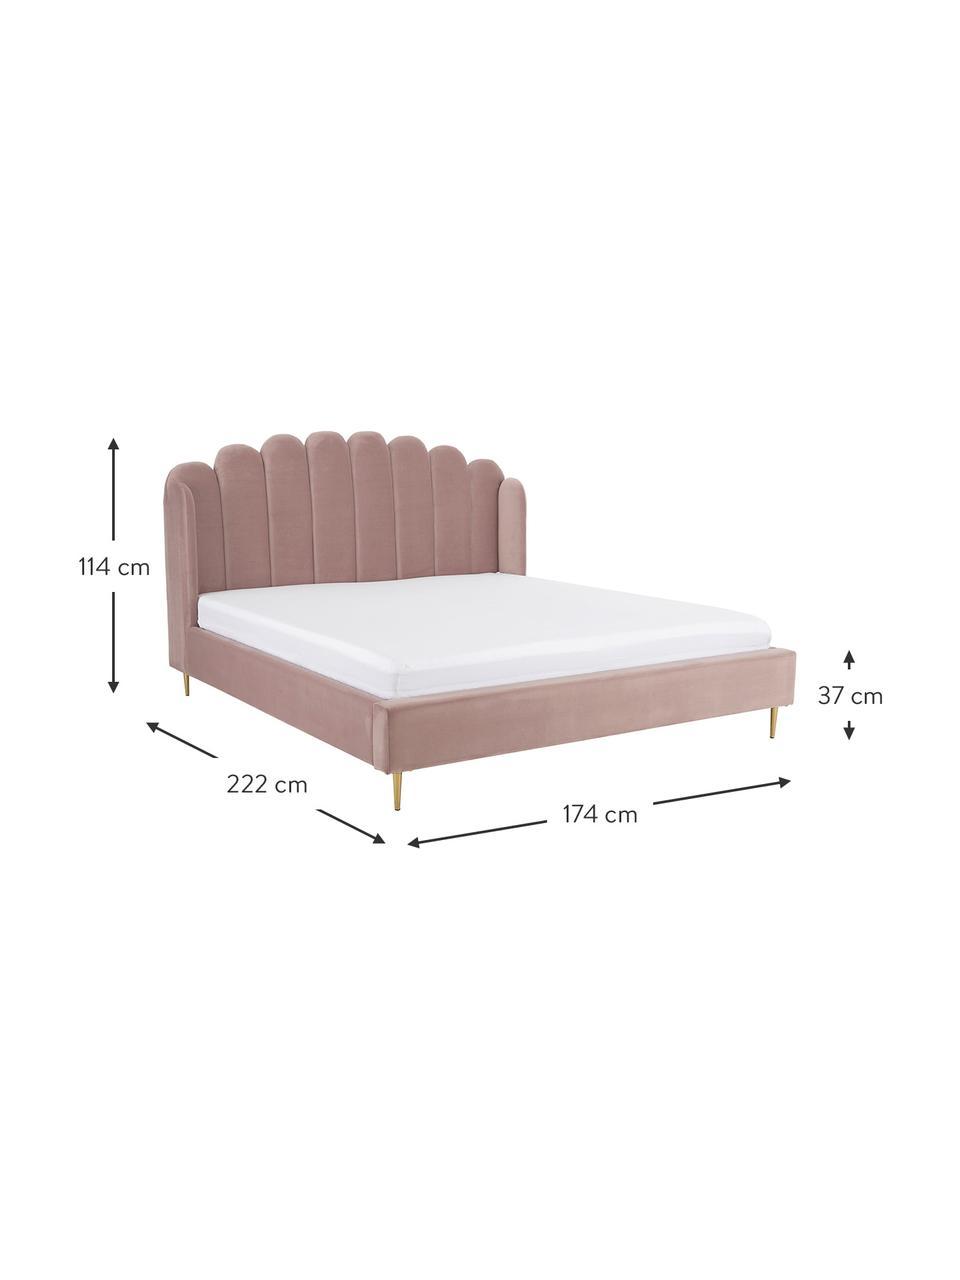 Gestoffeerd fluwelen bed Glamour in roze, Frame: massief grenenhout, Poten: vermessingd metaal, Bekleding: fluweel (polyester), Fluweel roze, 160 x 200 cm